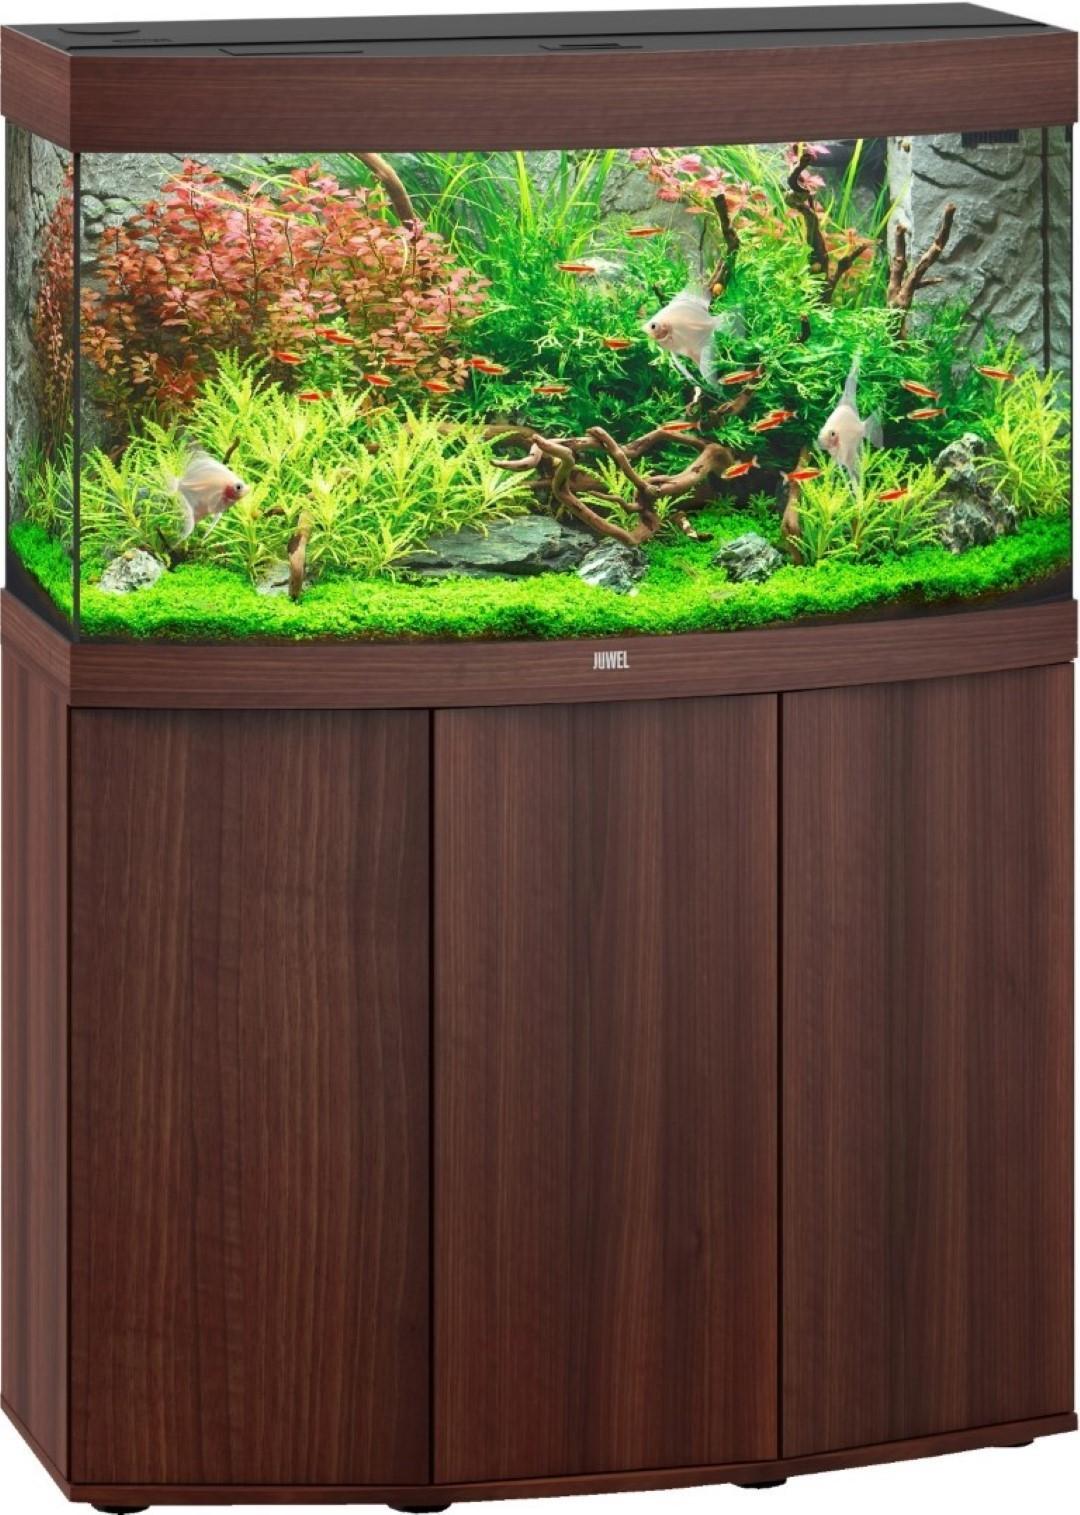 Juwel aquarium Vision 180 LED met filter donkerbruin